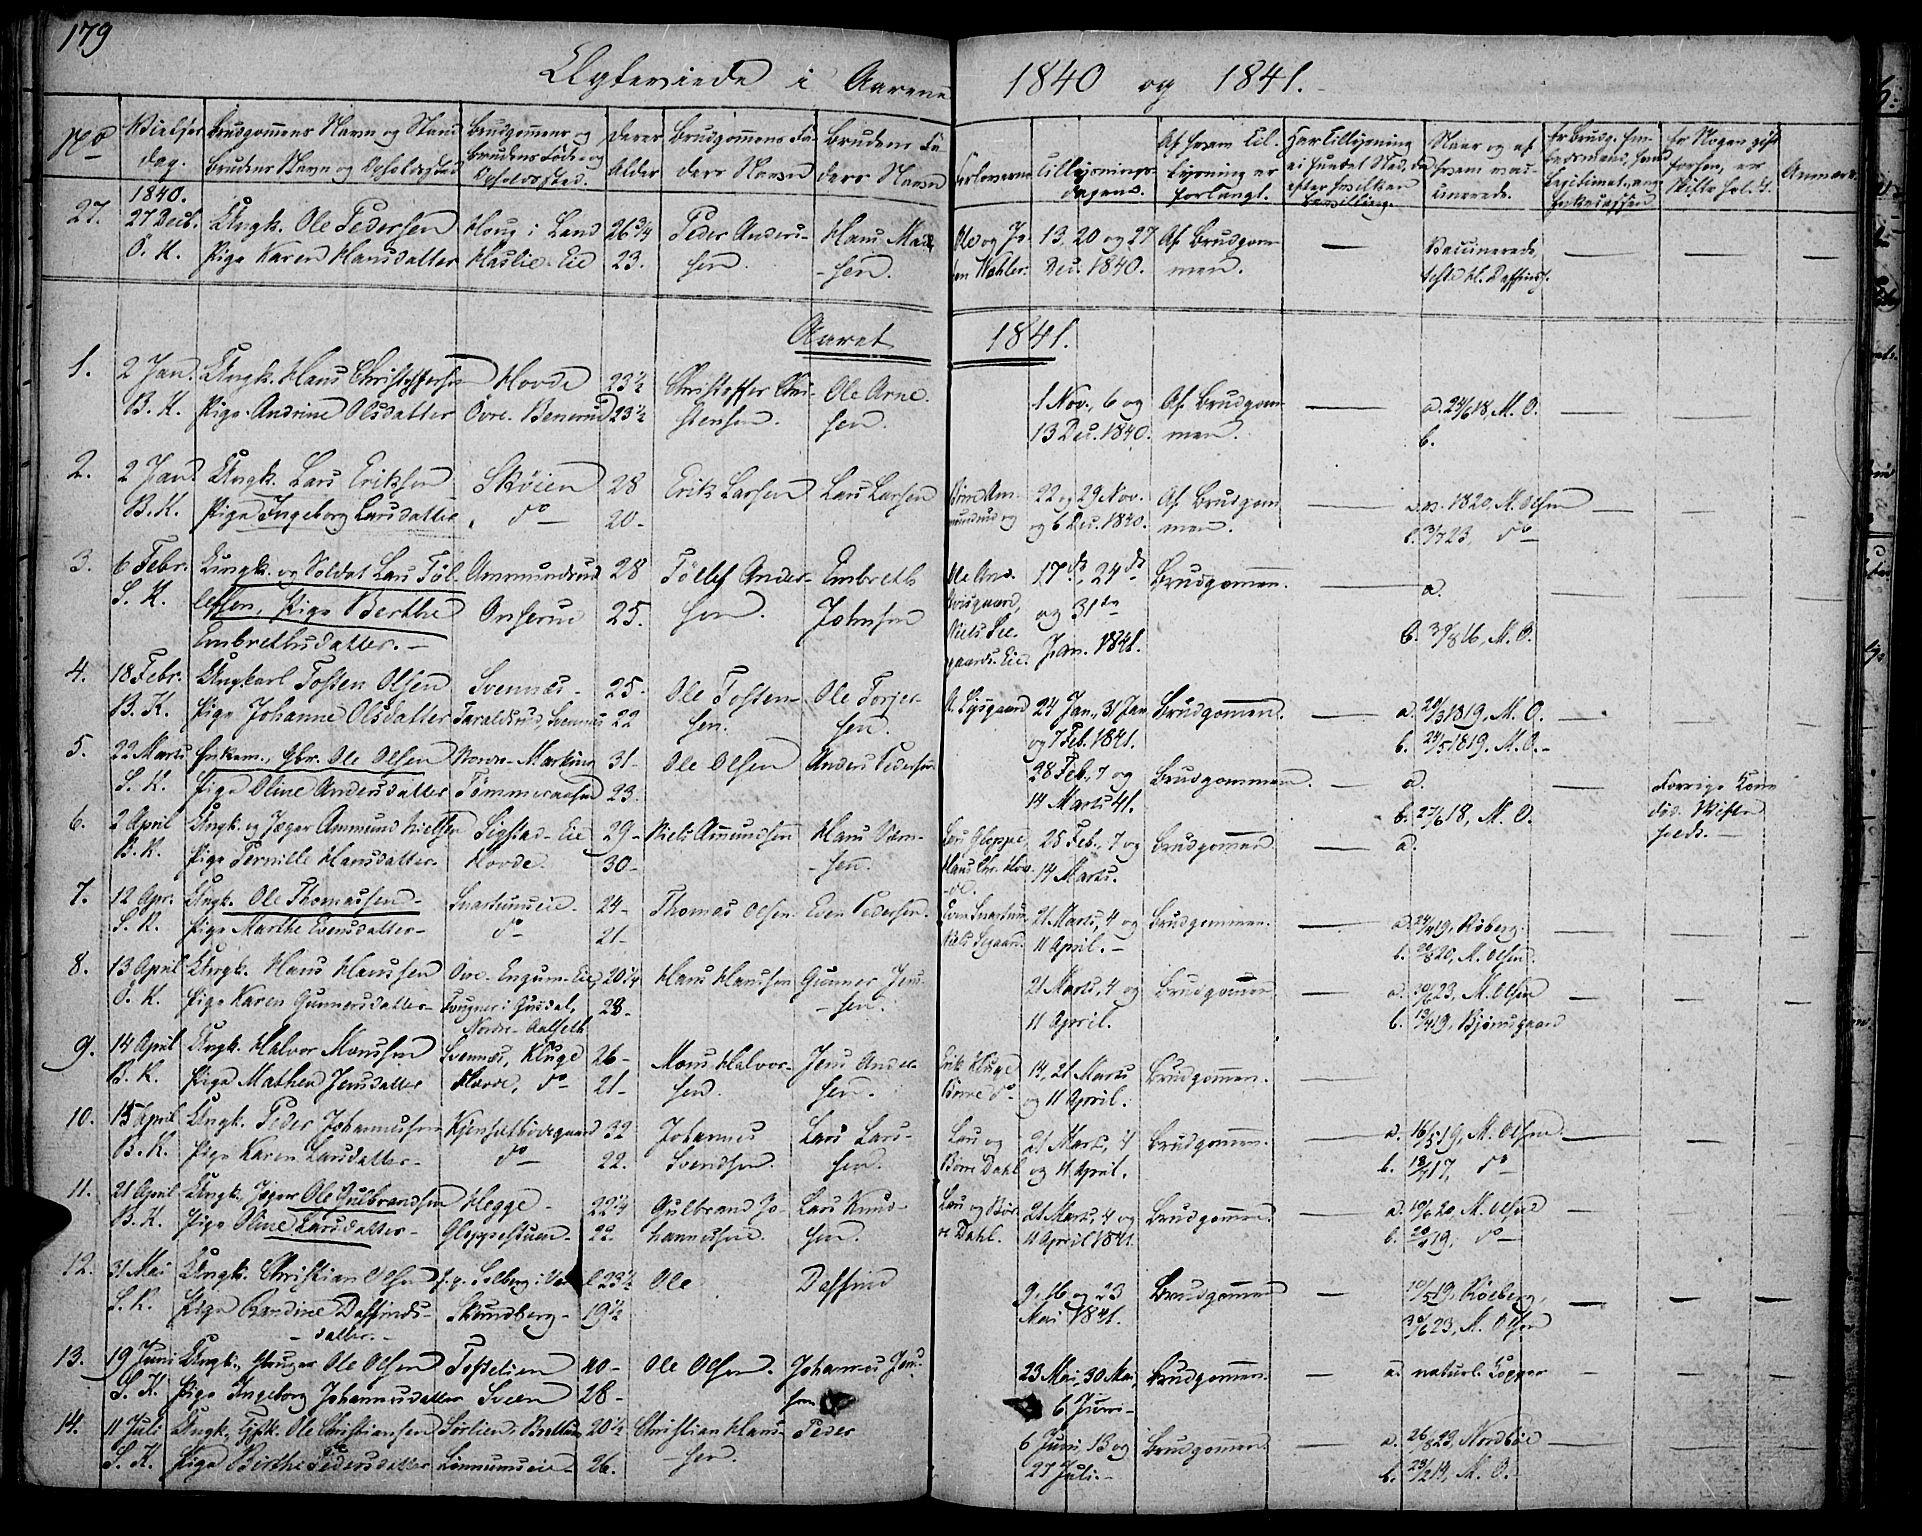 SAH, Biri prestekontor, Ministerialbok nr. 4, 1829-1842, s. 179